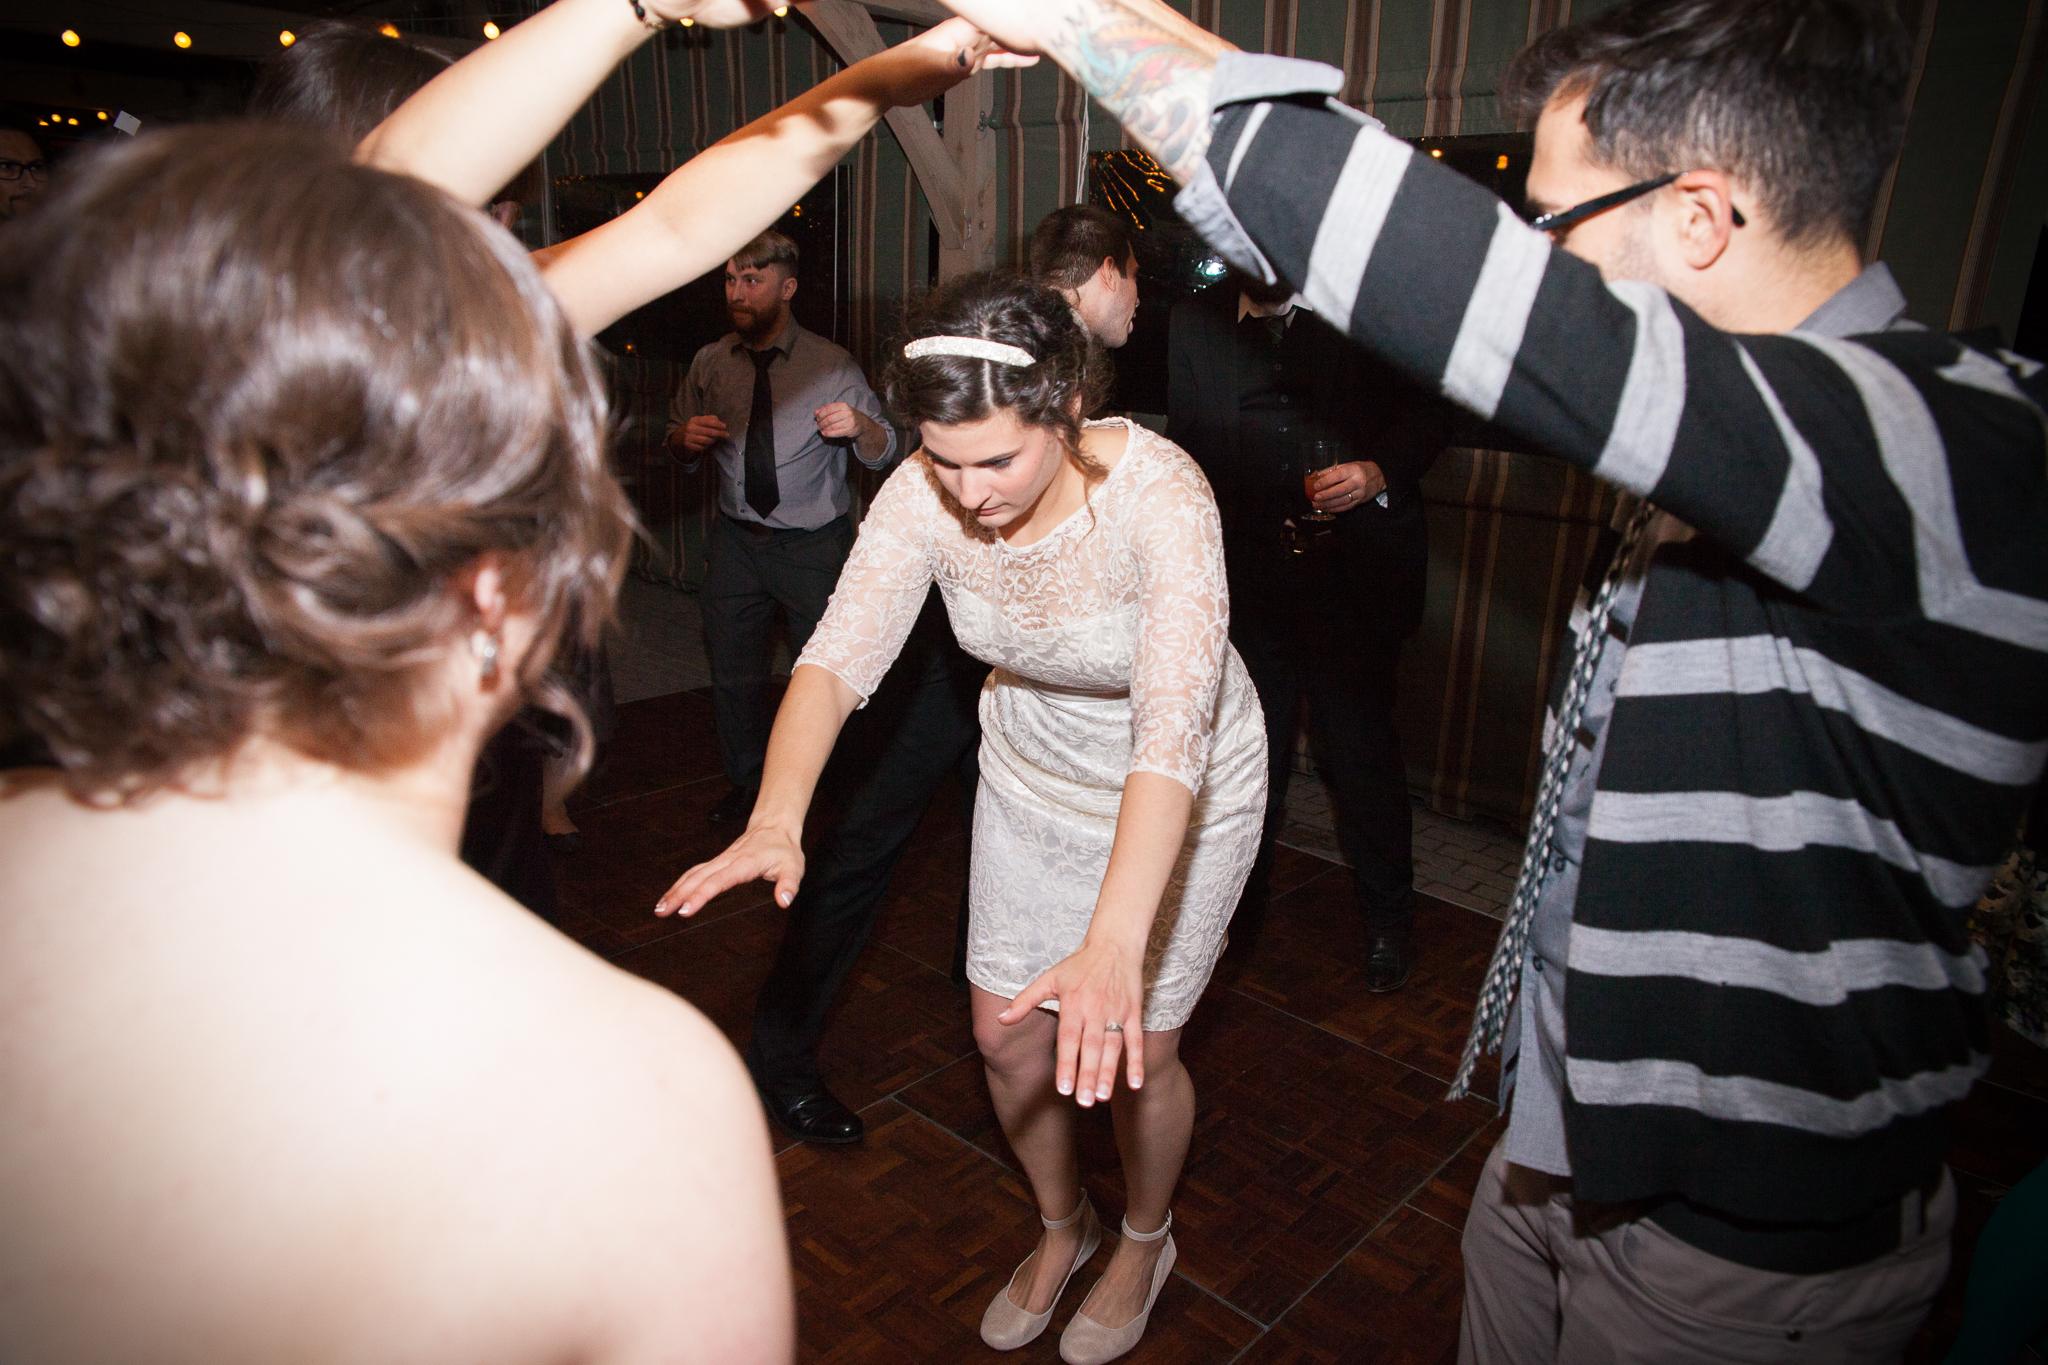 camuglia-whomstudio-chelsea_and_andy-nycphotographer-wedding-brooklyn-buffalo-timberlodge-175-1241.jpg